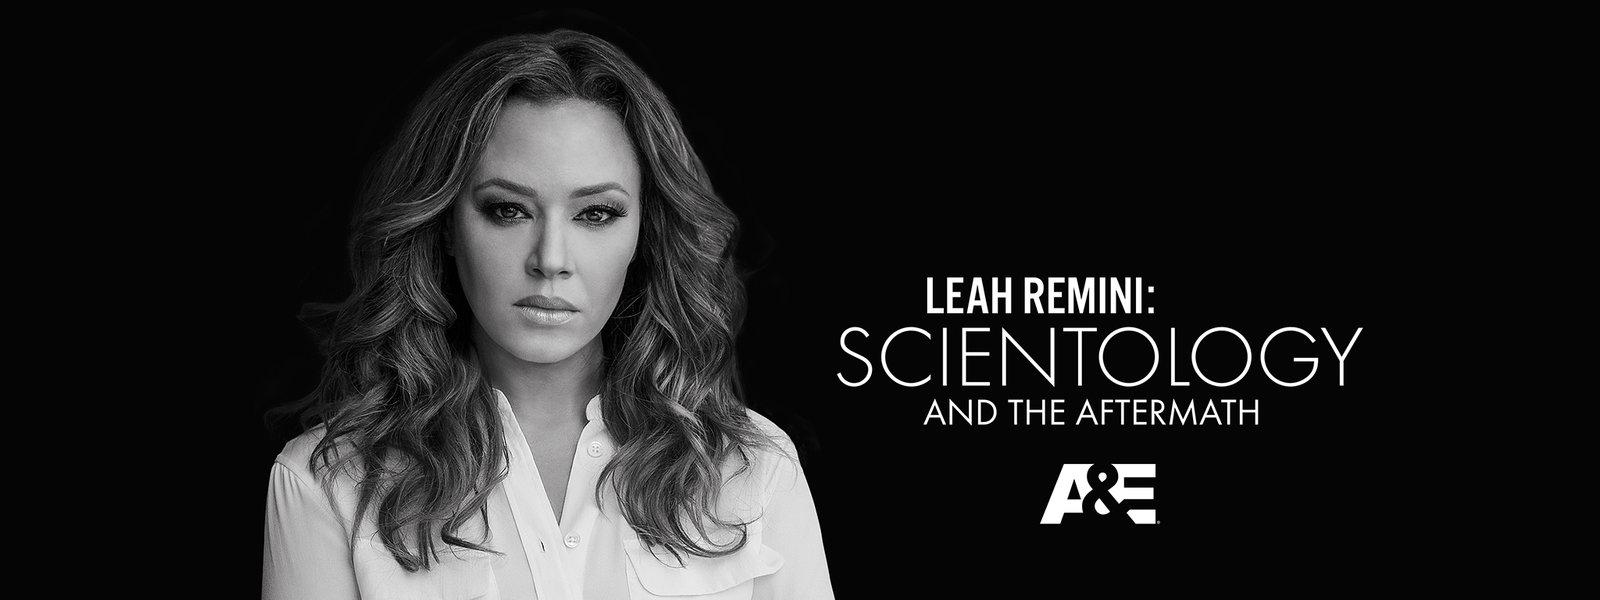 Leah Remini coolen.jpeg